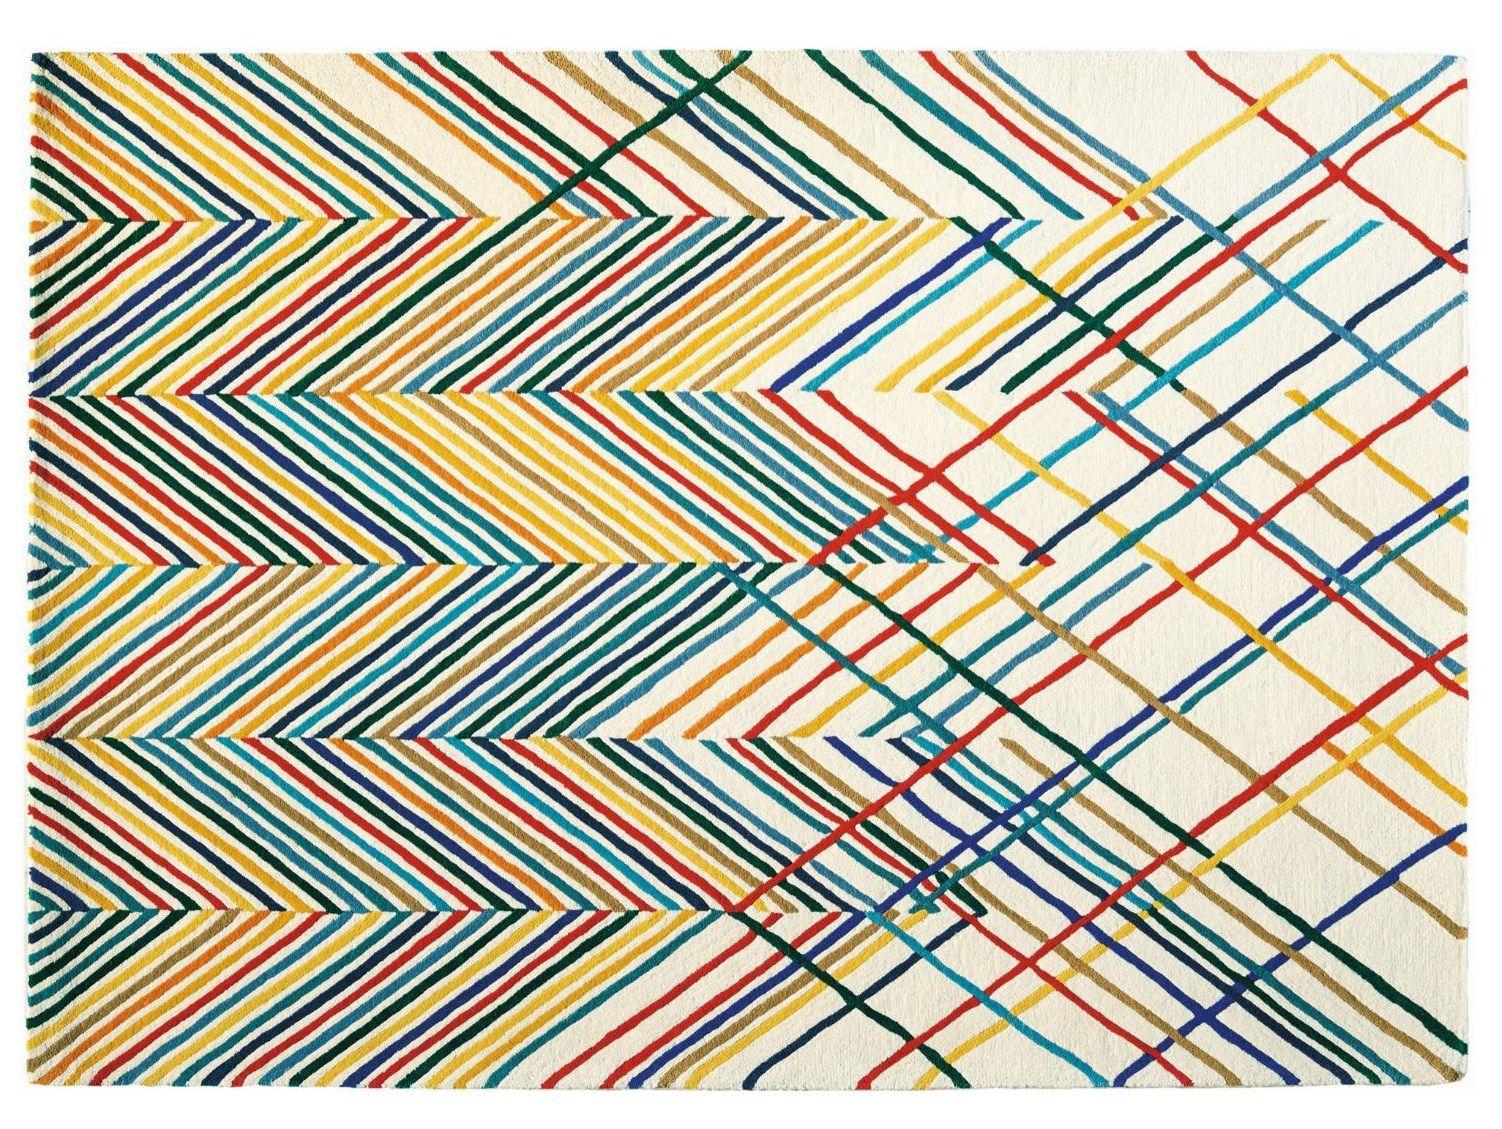 tapis fait main rayures en laine spike by toulemonde bochart design estudihac. Black Bedroom Furniture Sets. Home Design Ideas